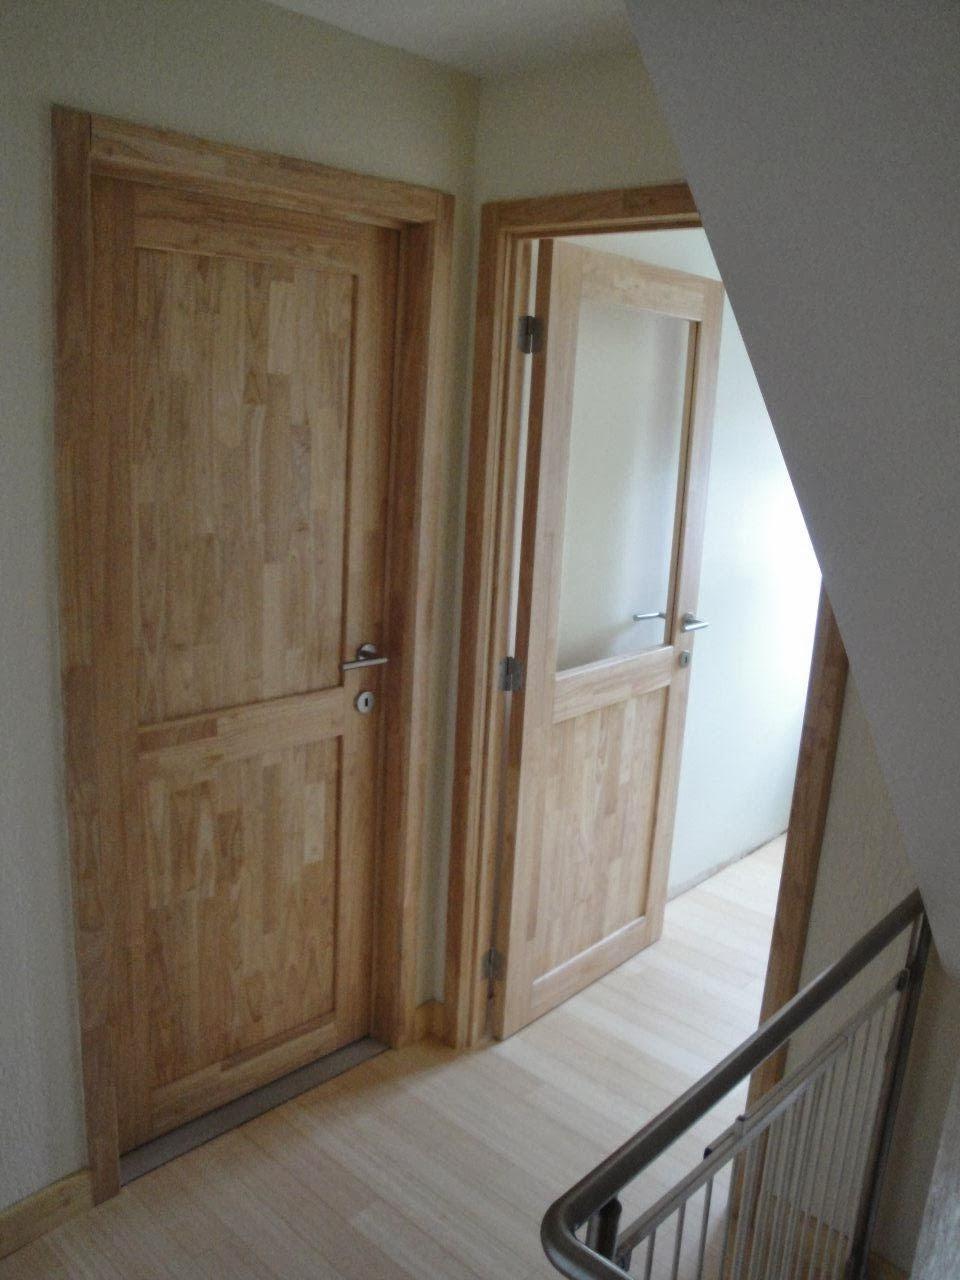 Keukenkasten Met Glas : Fran?ois bosch bvba rubberwood deuren met en ...